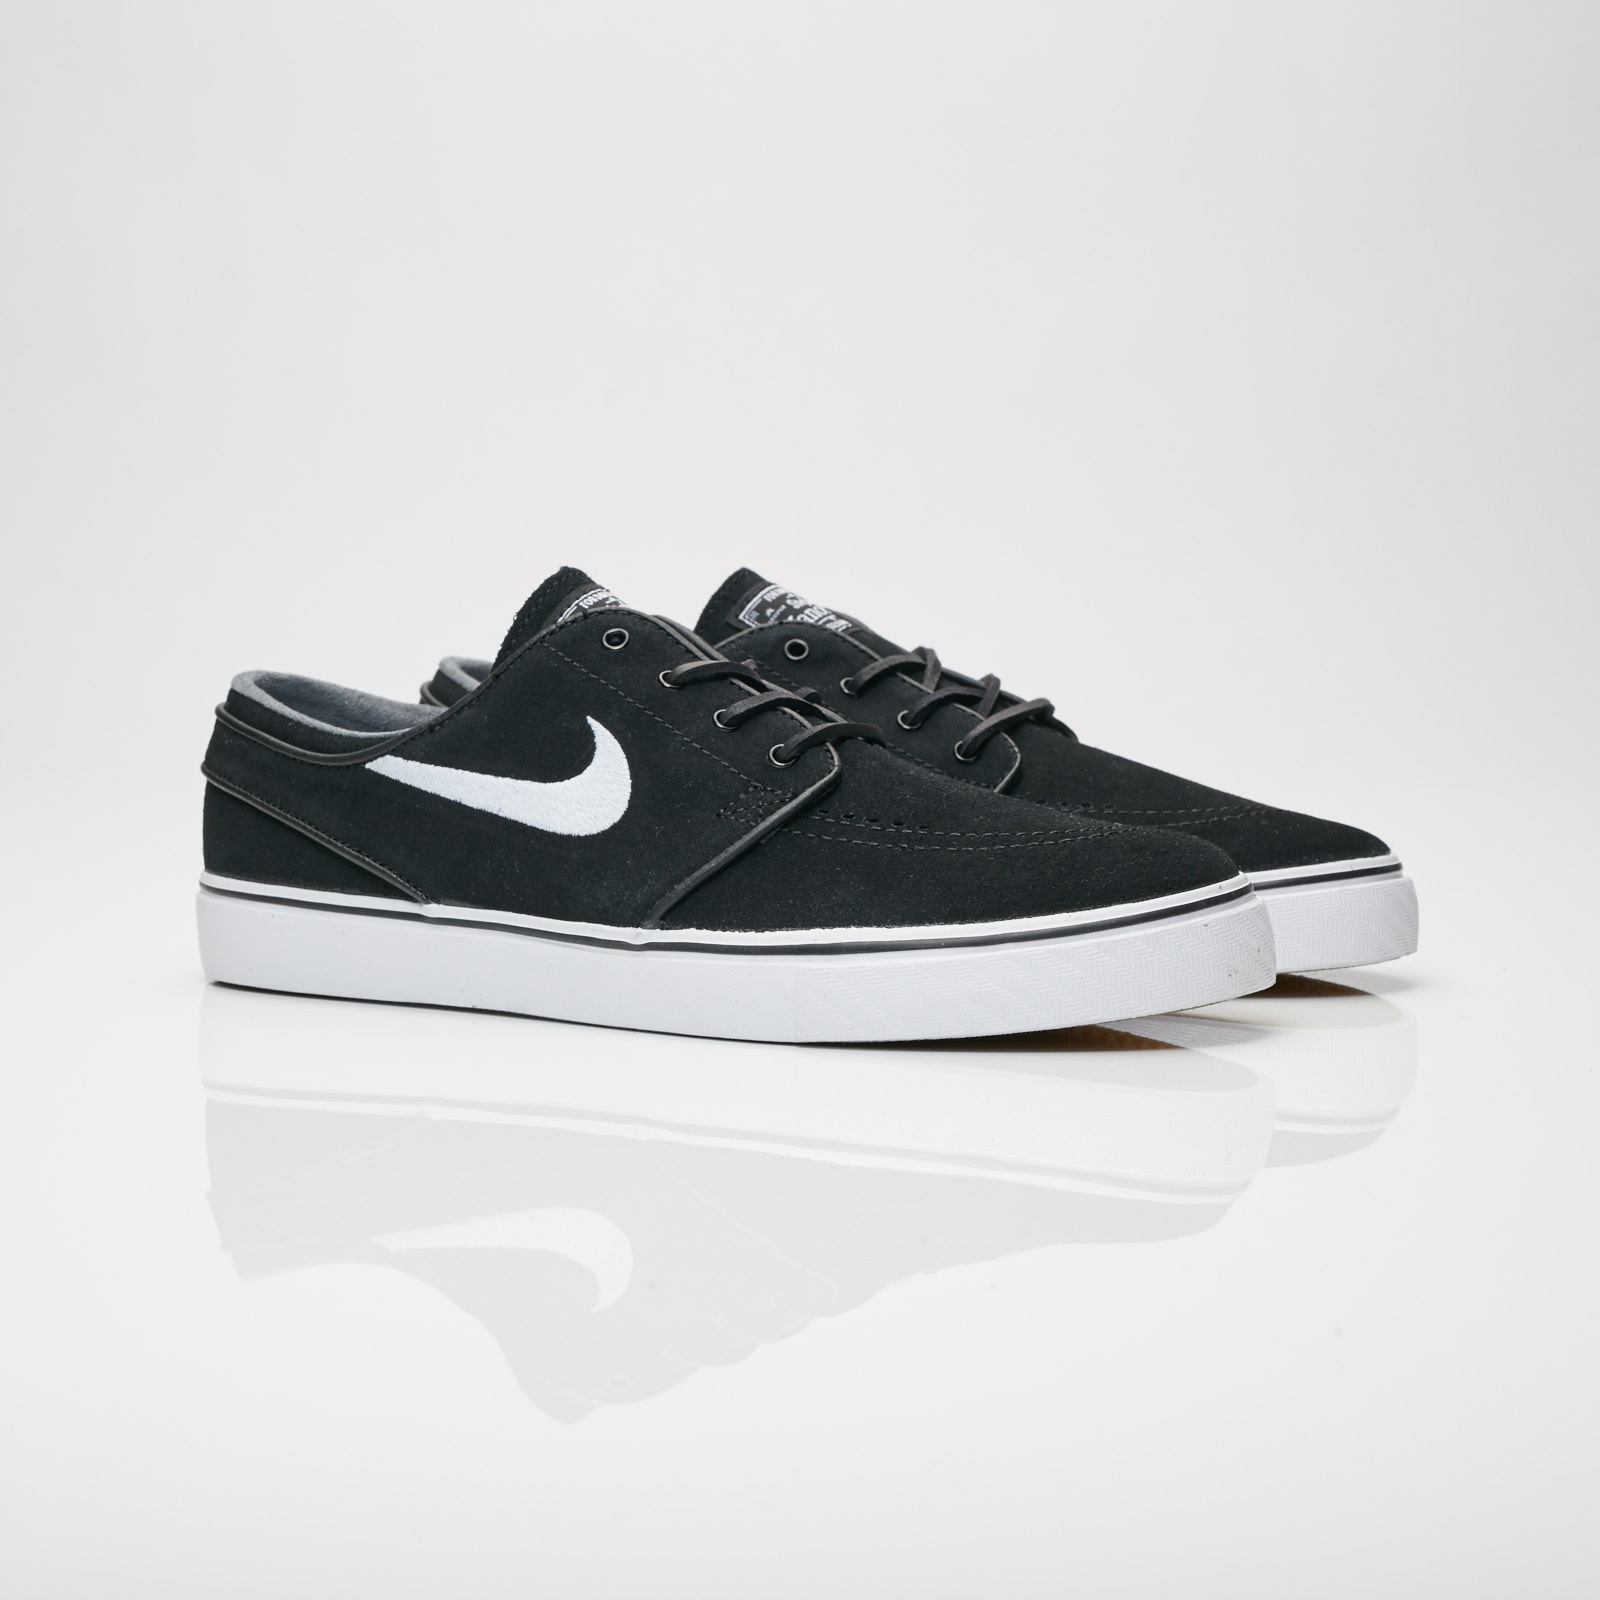 79d3ffcf915a Nike Zoom Stefan Janoski OG - 833603-012 - Sneakersnstuff